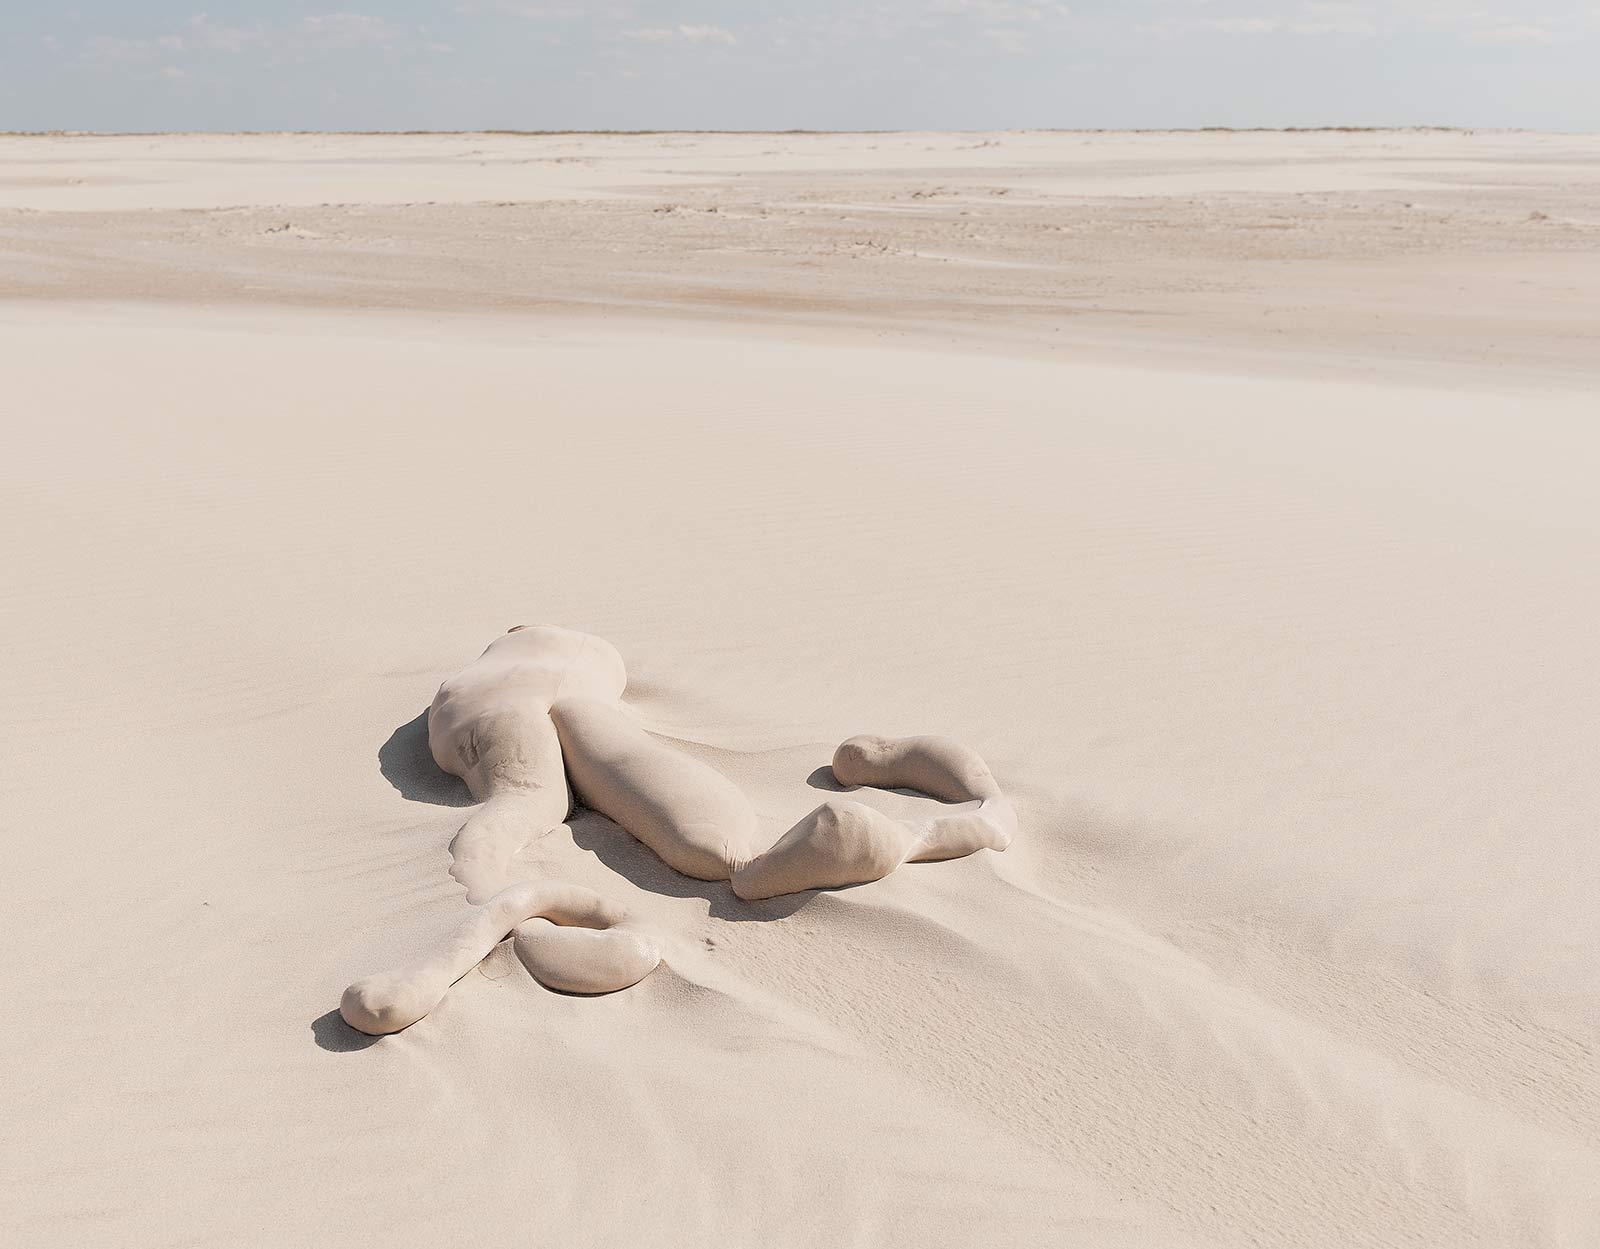 fabian_matz_2017_shaped_bodies_sand_polyamide_tights_02